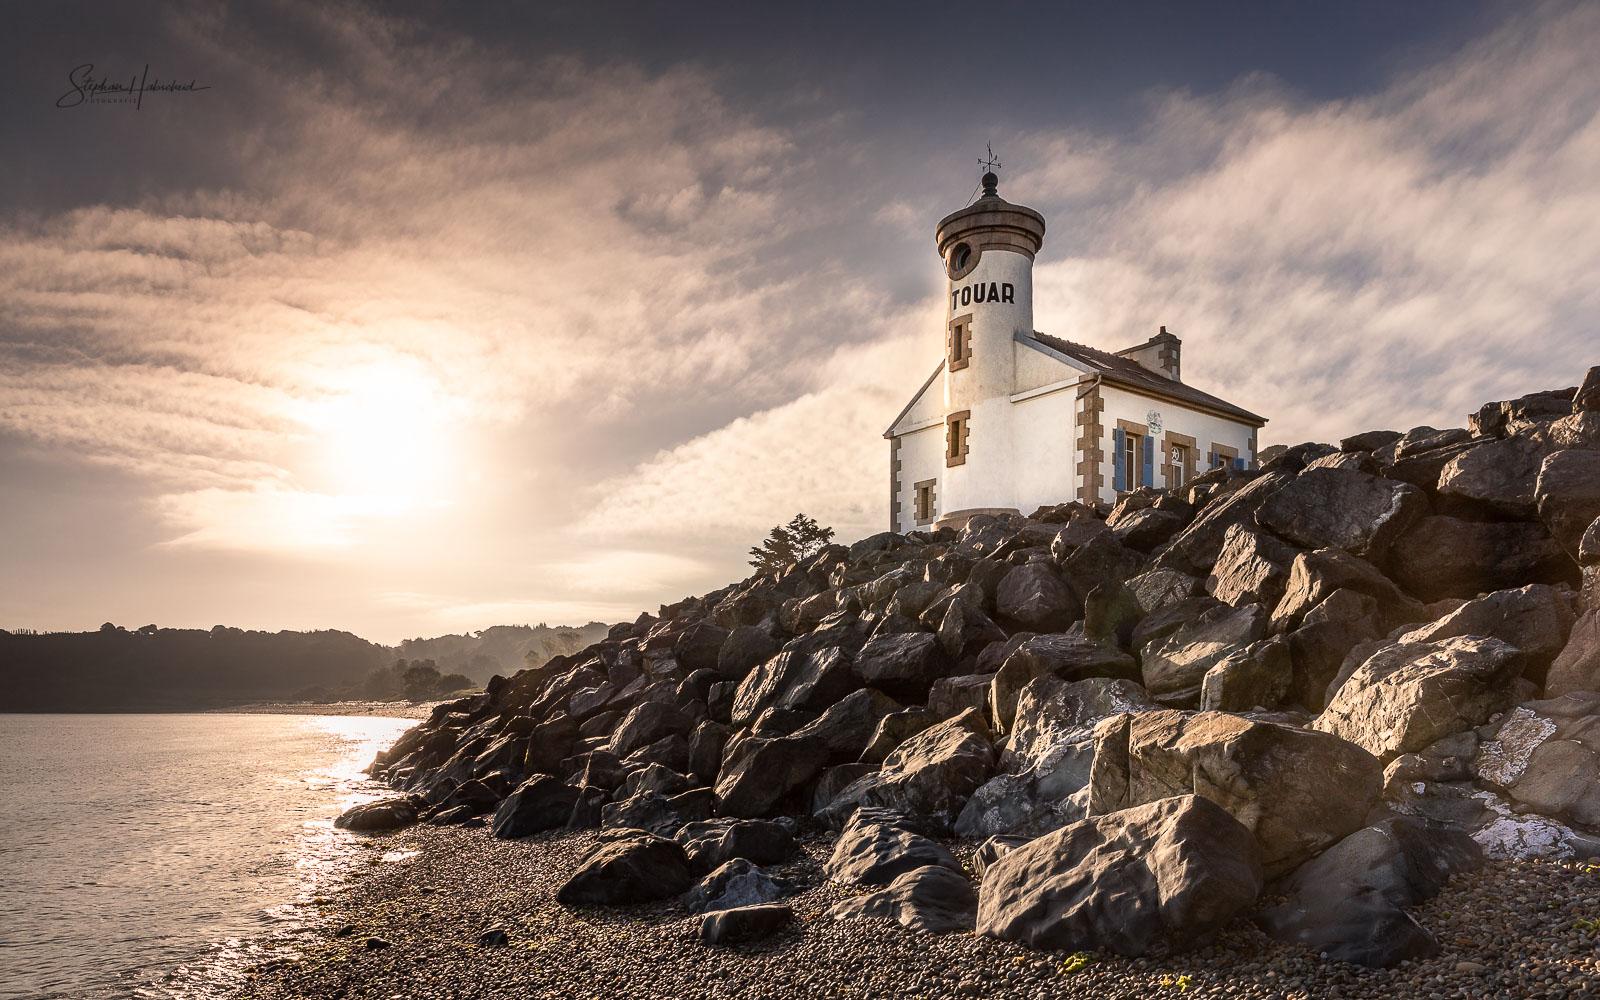 Lighthouse of Nantouar, France